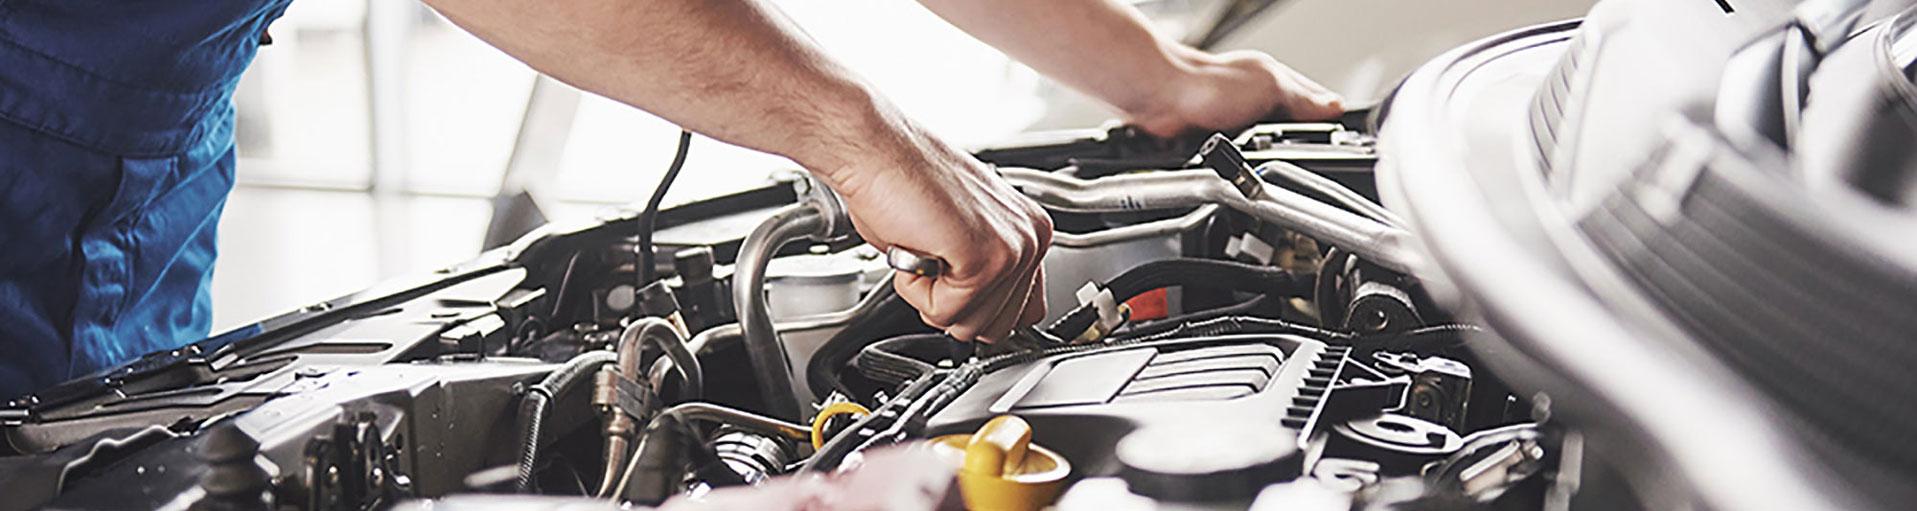 Glenn Polk Chevrolet Buick GMC Service Department